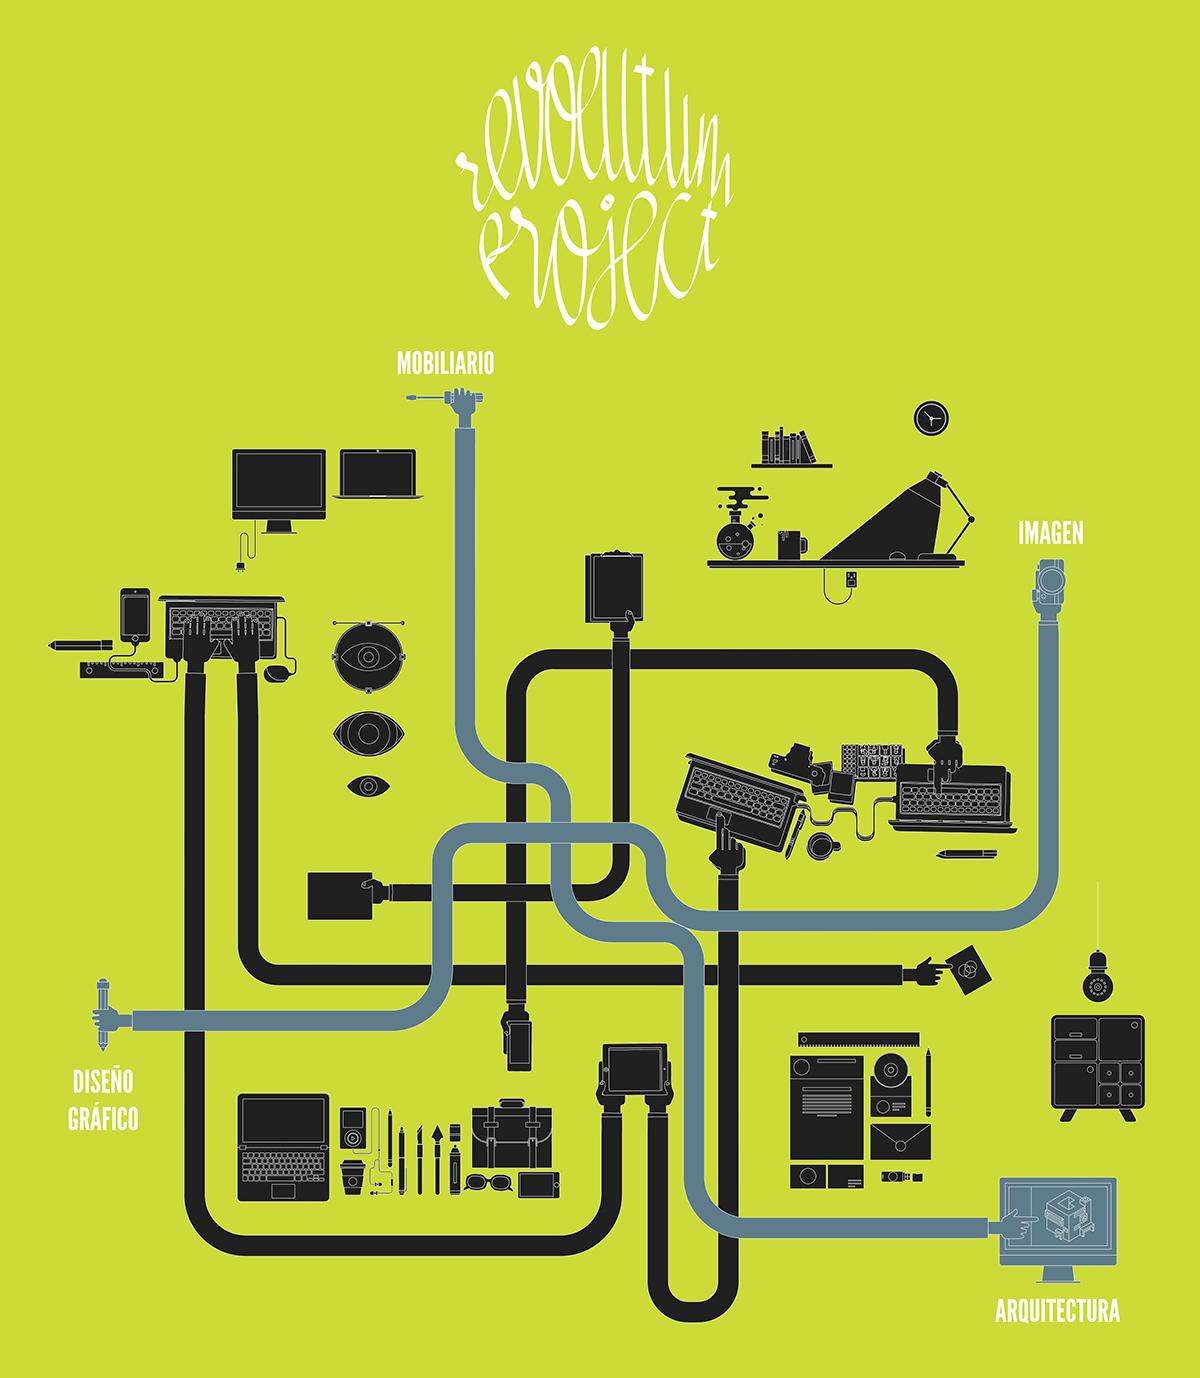 revolutum Project revolutumproject infografia ilustracion infographic